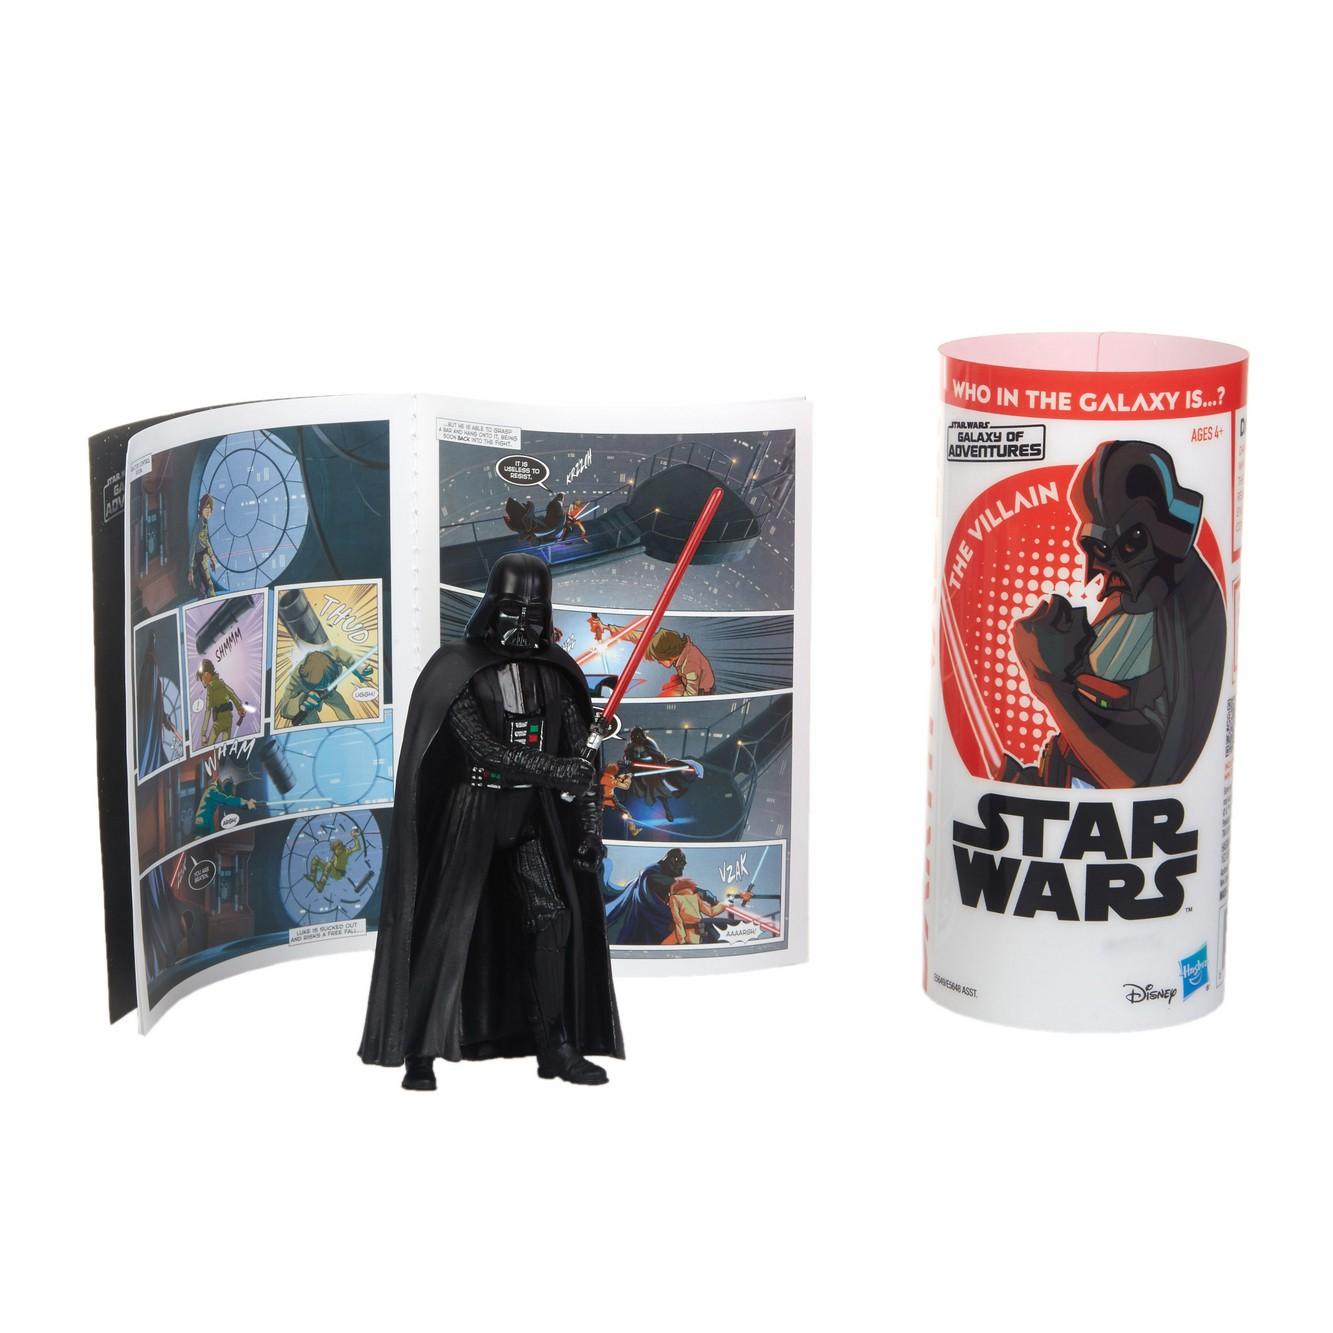 Hasbro reveal their Star Wars: Galaxy of Adventures range of figures ...